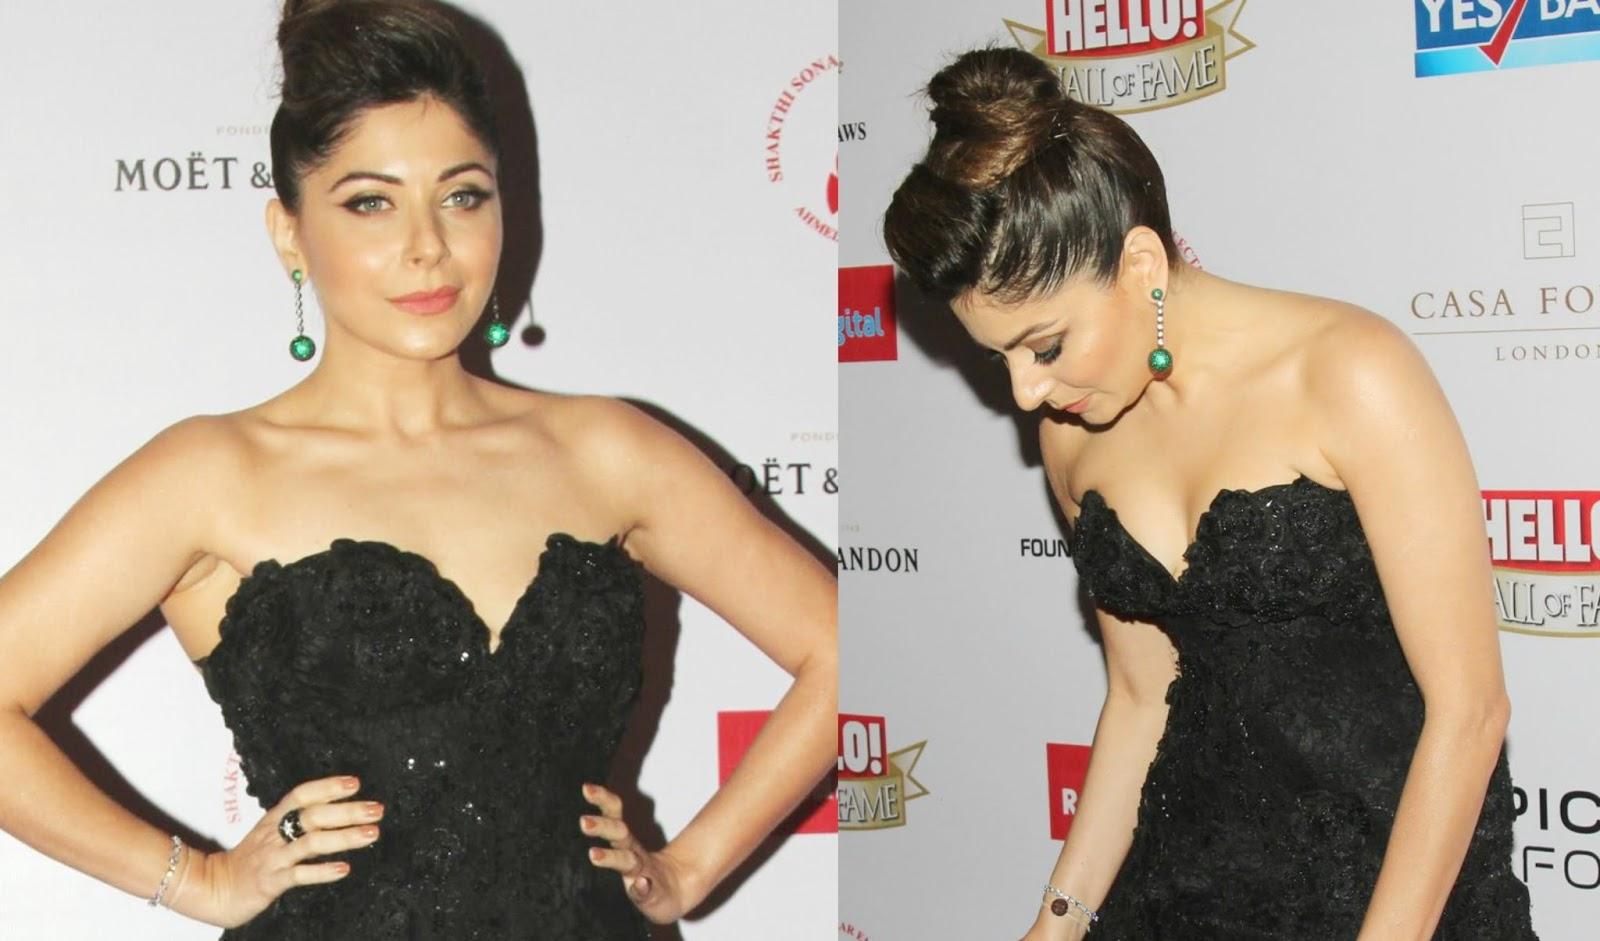 Bollywood Hottie: Singer Kanika Kapoor